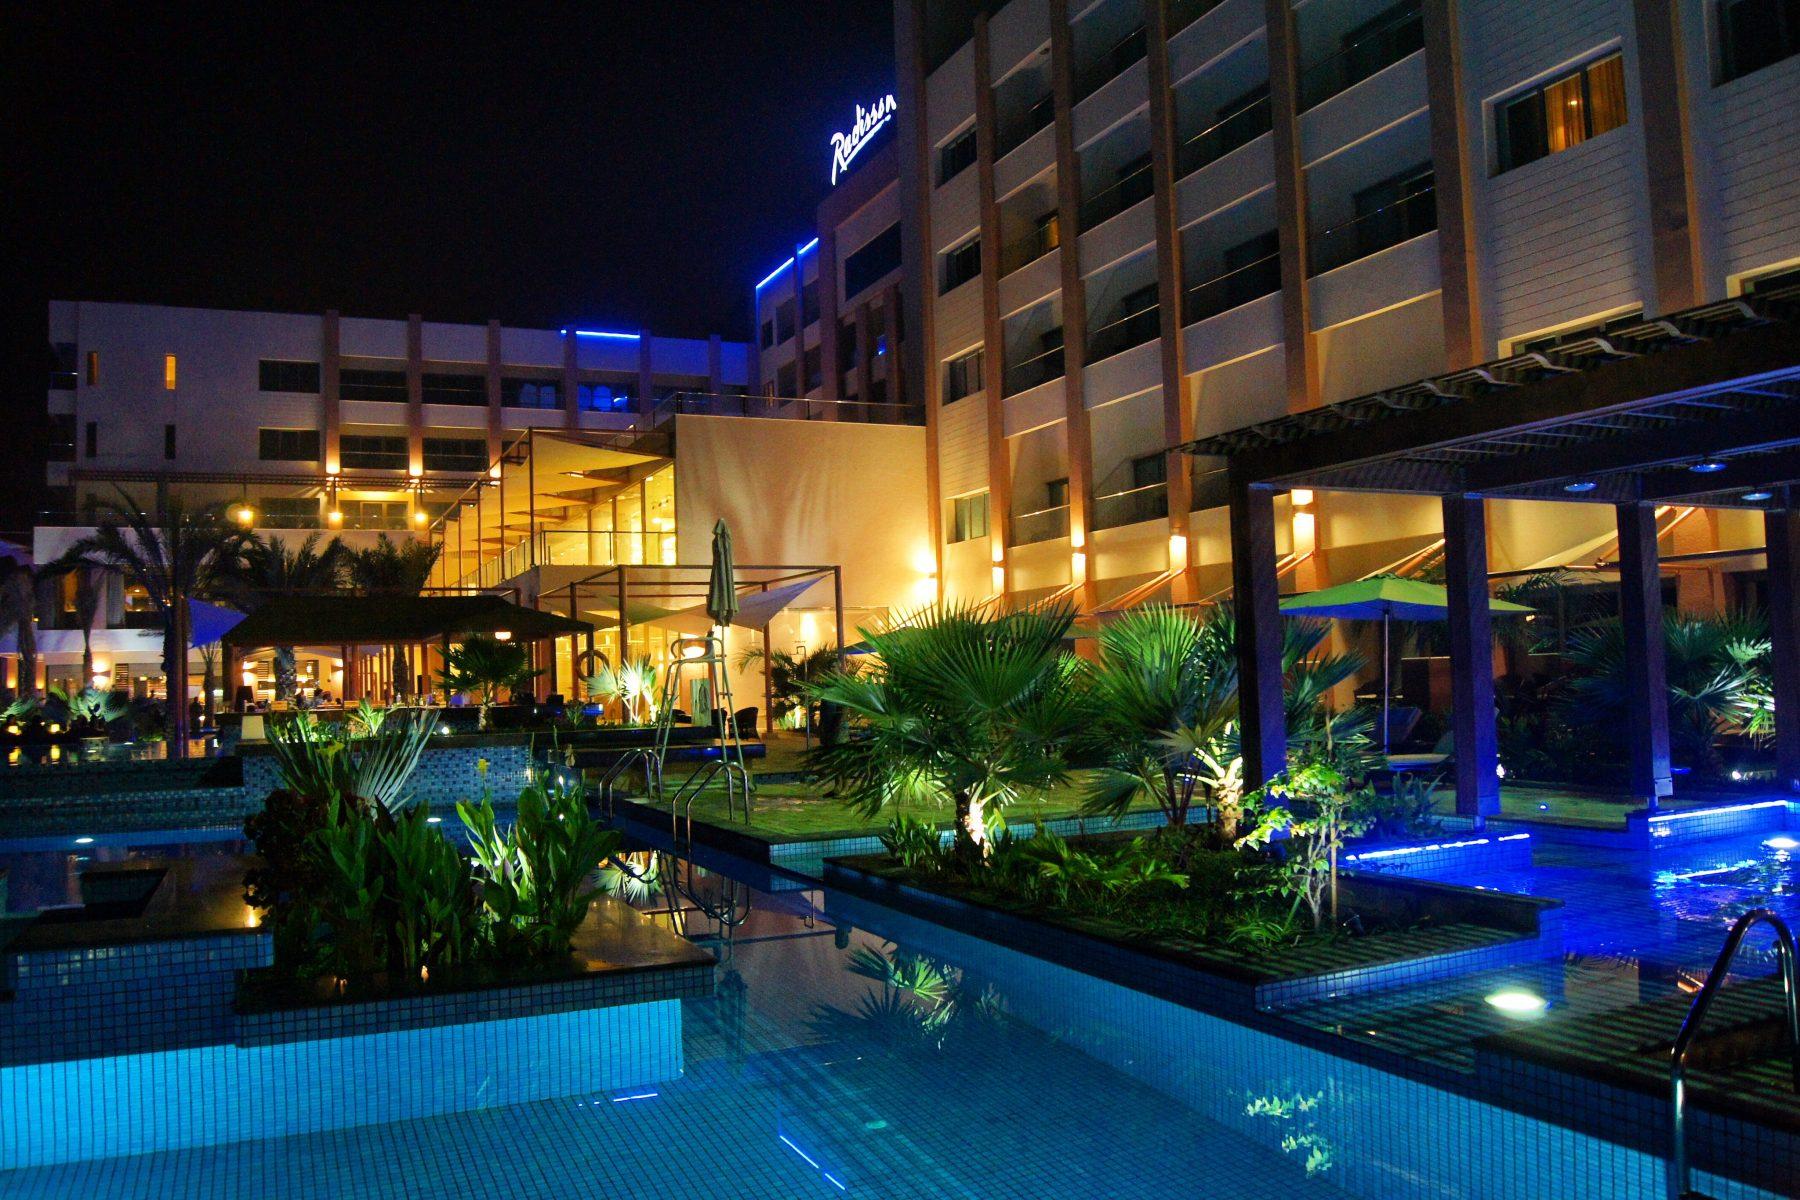 Spoilt for Choice - Reviewing the Radisson Blu Sohar, Oman